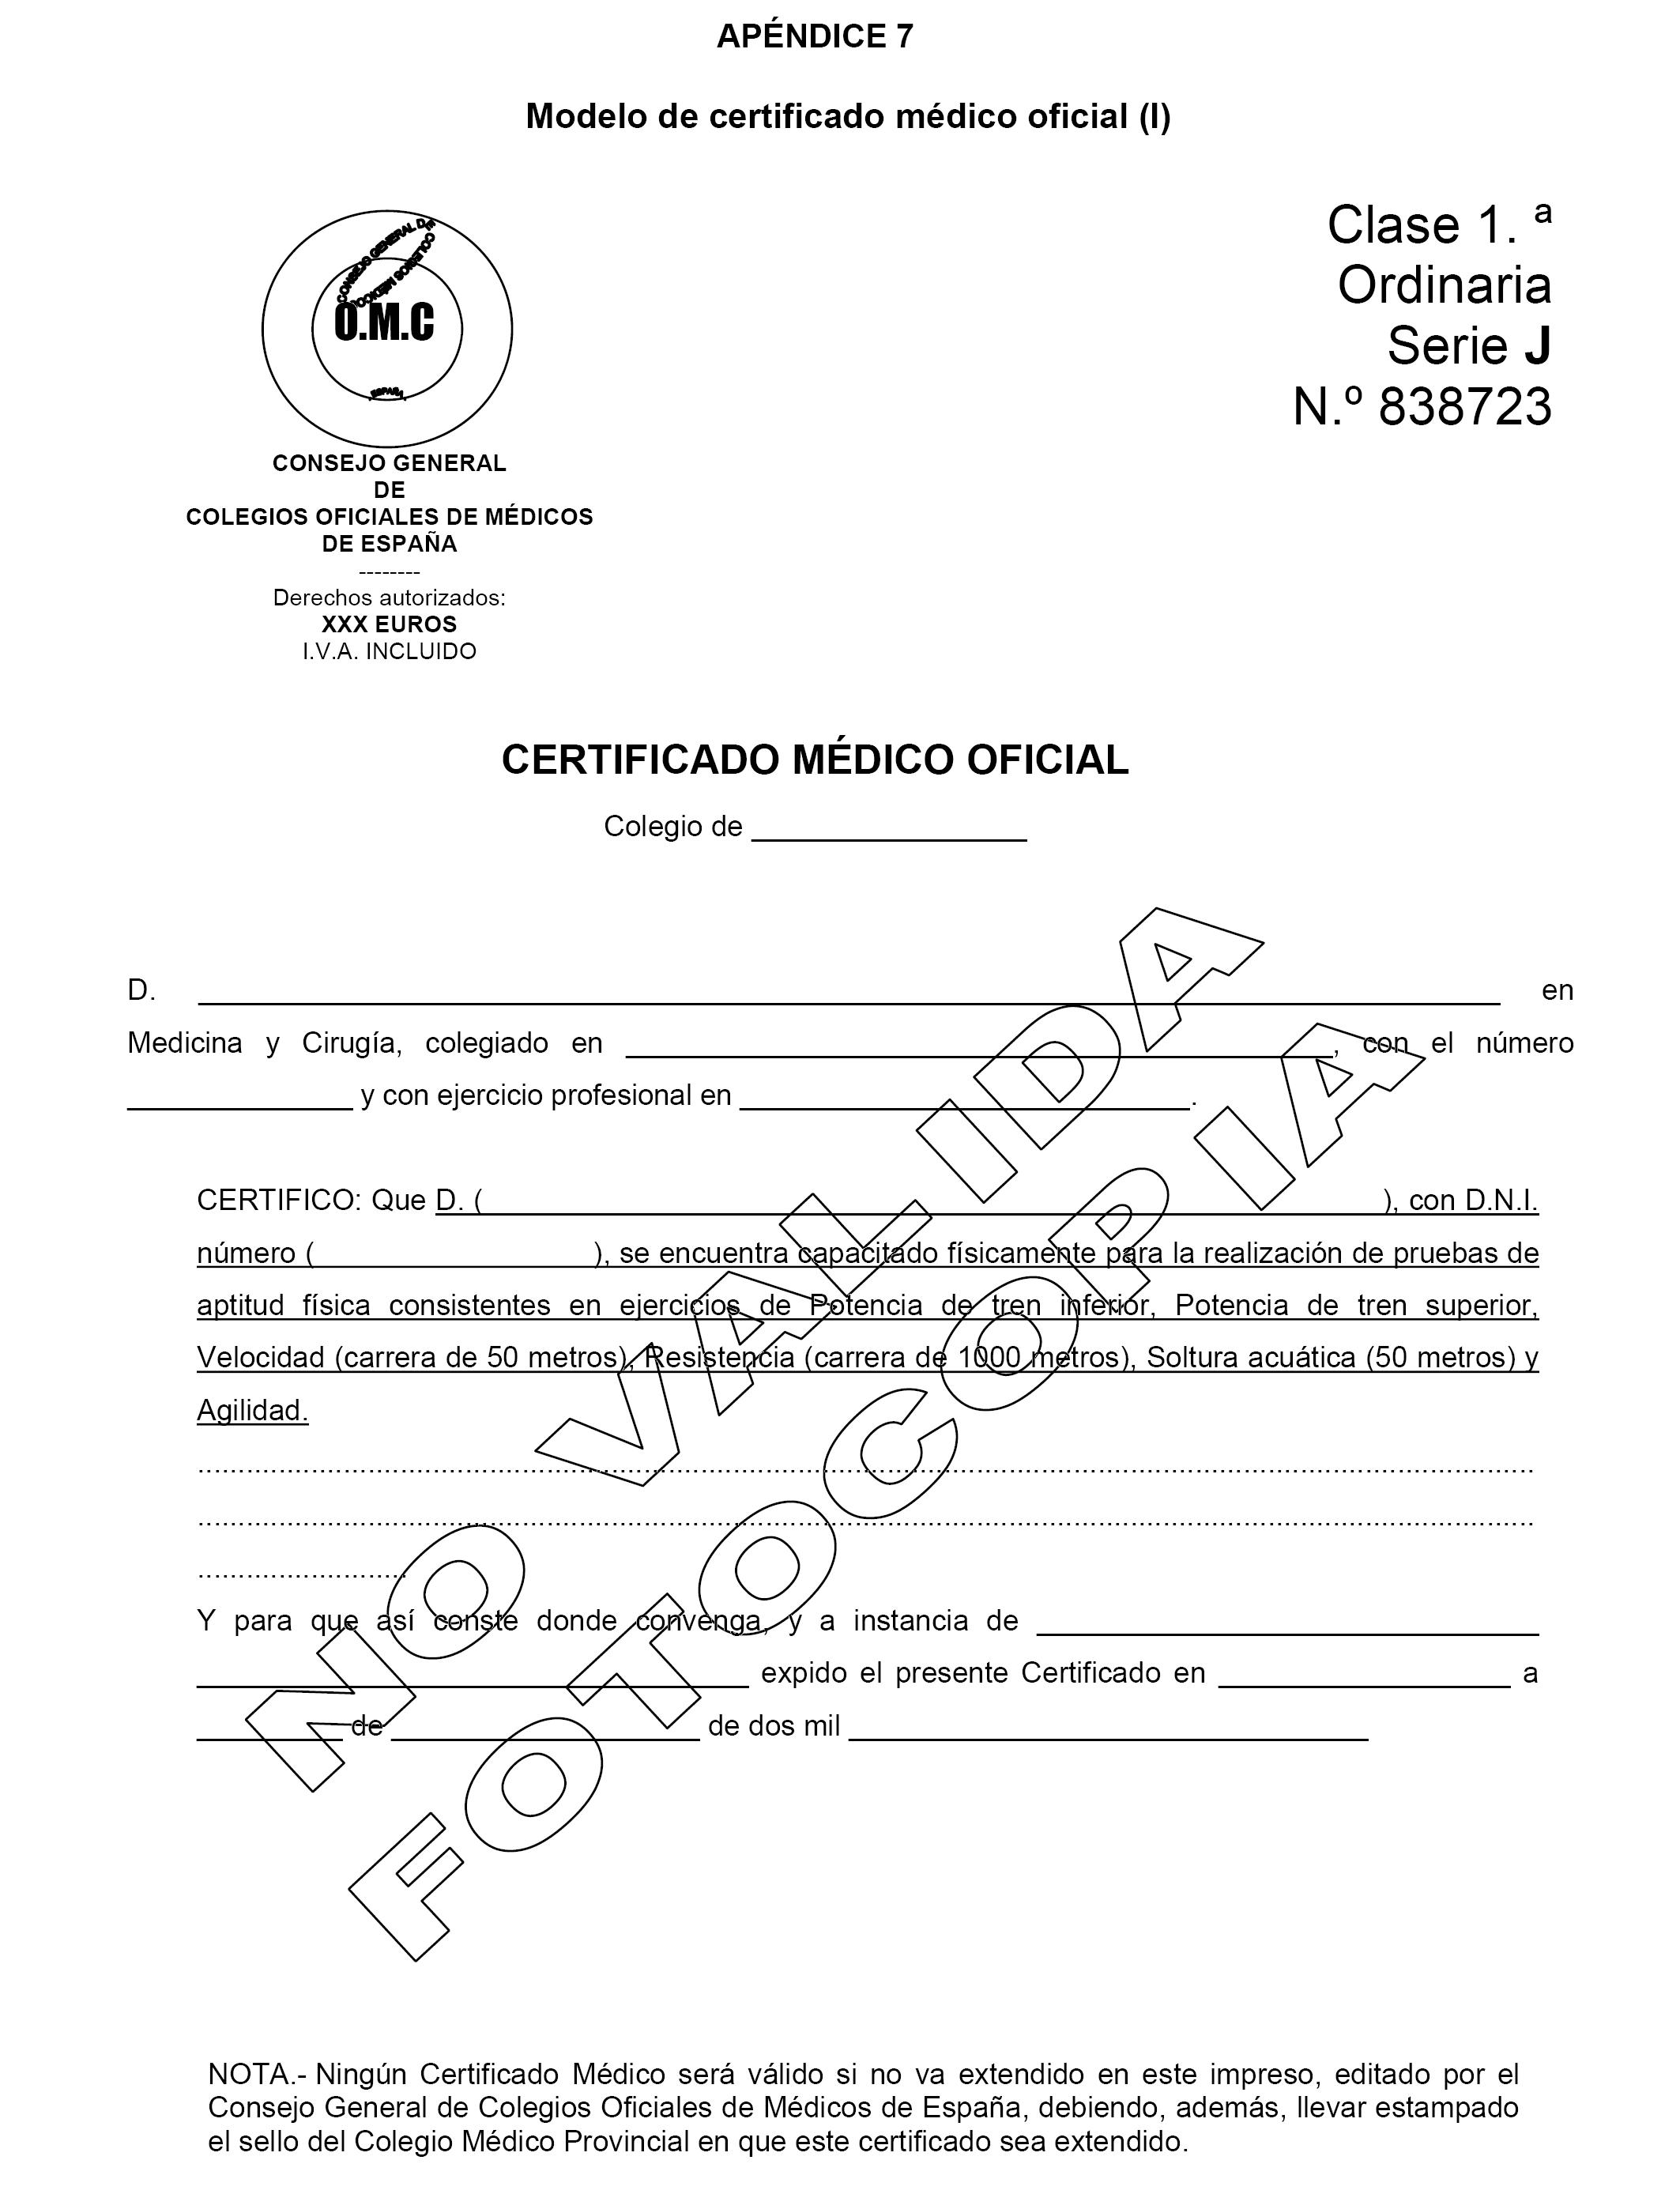 BOE.es - Documento BOE-A-2017-5913